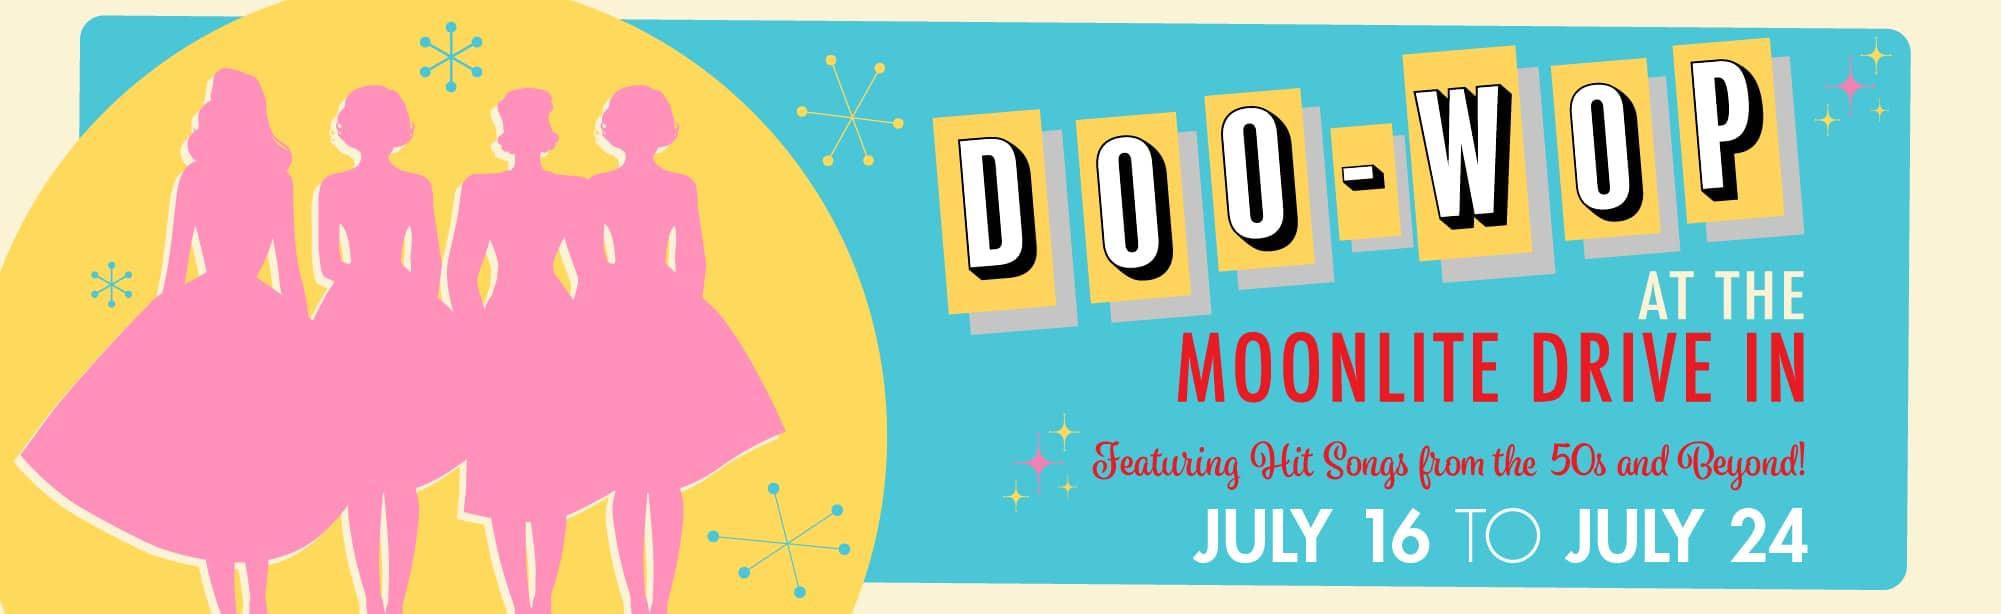 Doo-Wop Barter at the Moonlite Web Banner